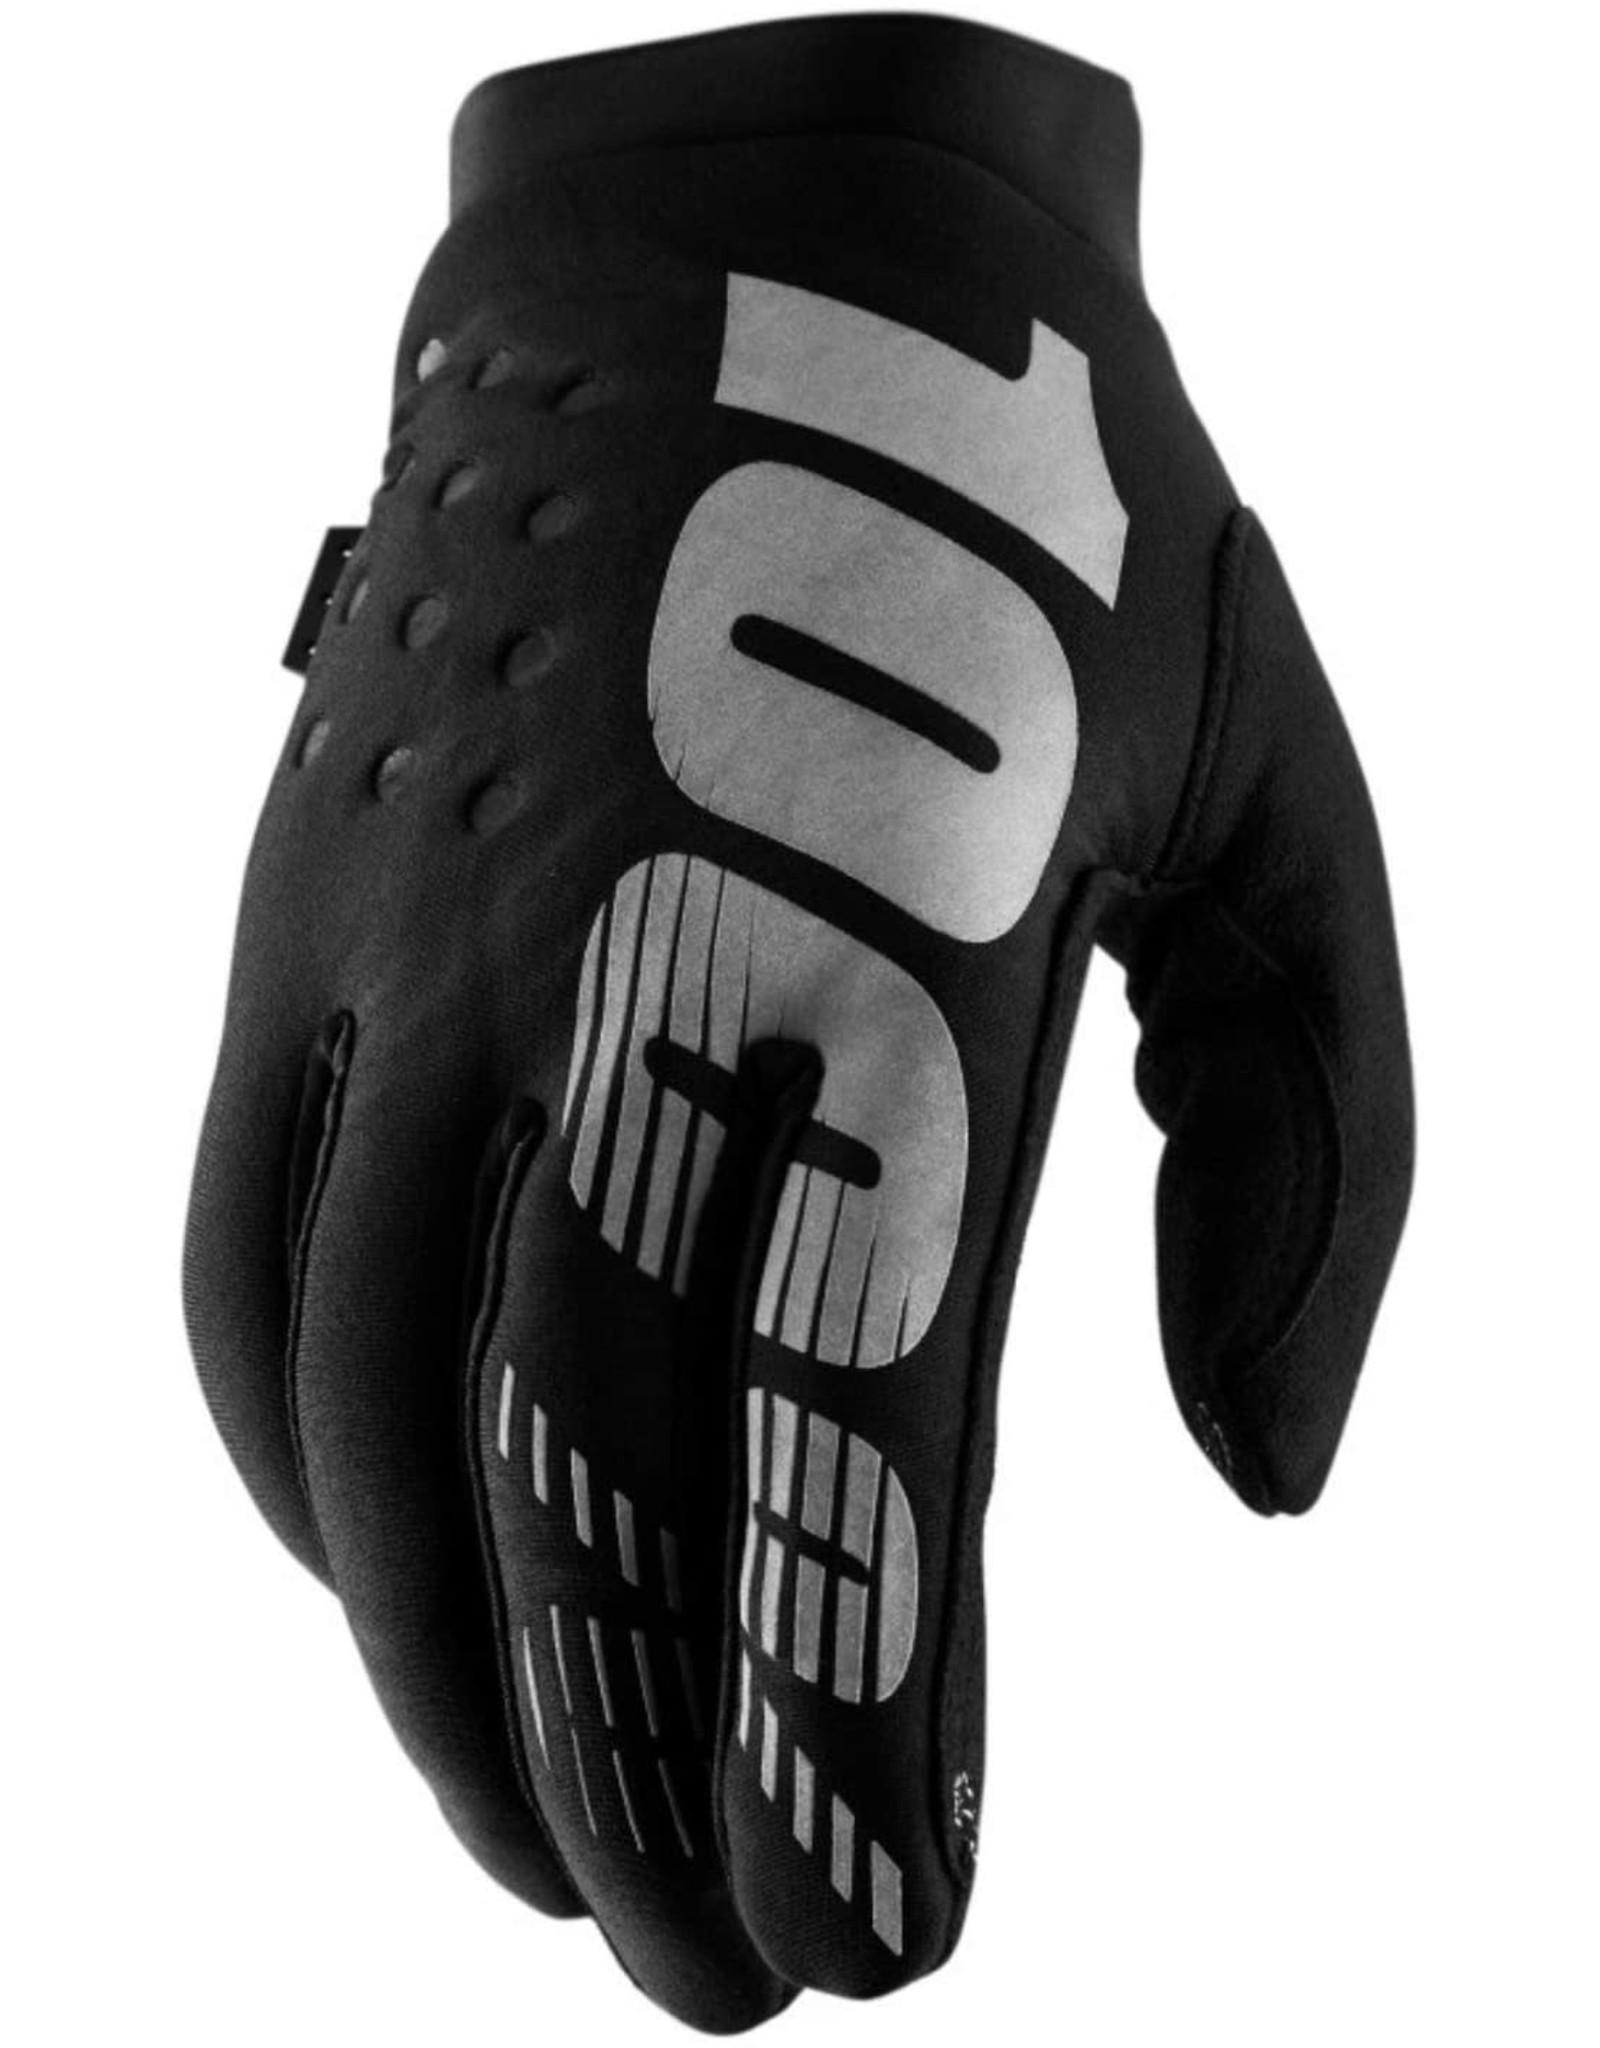 100% 100% - BRISKER  Glove Black/Grey M